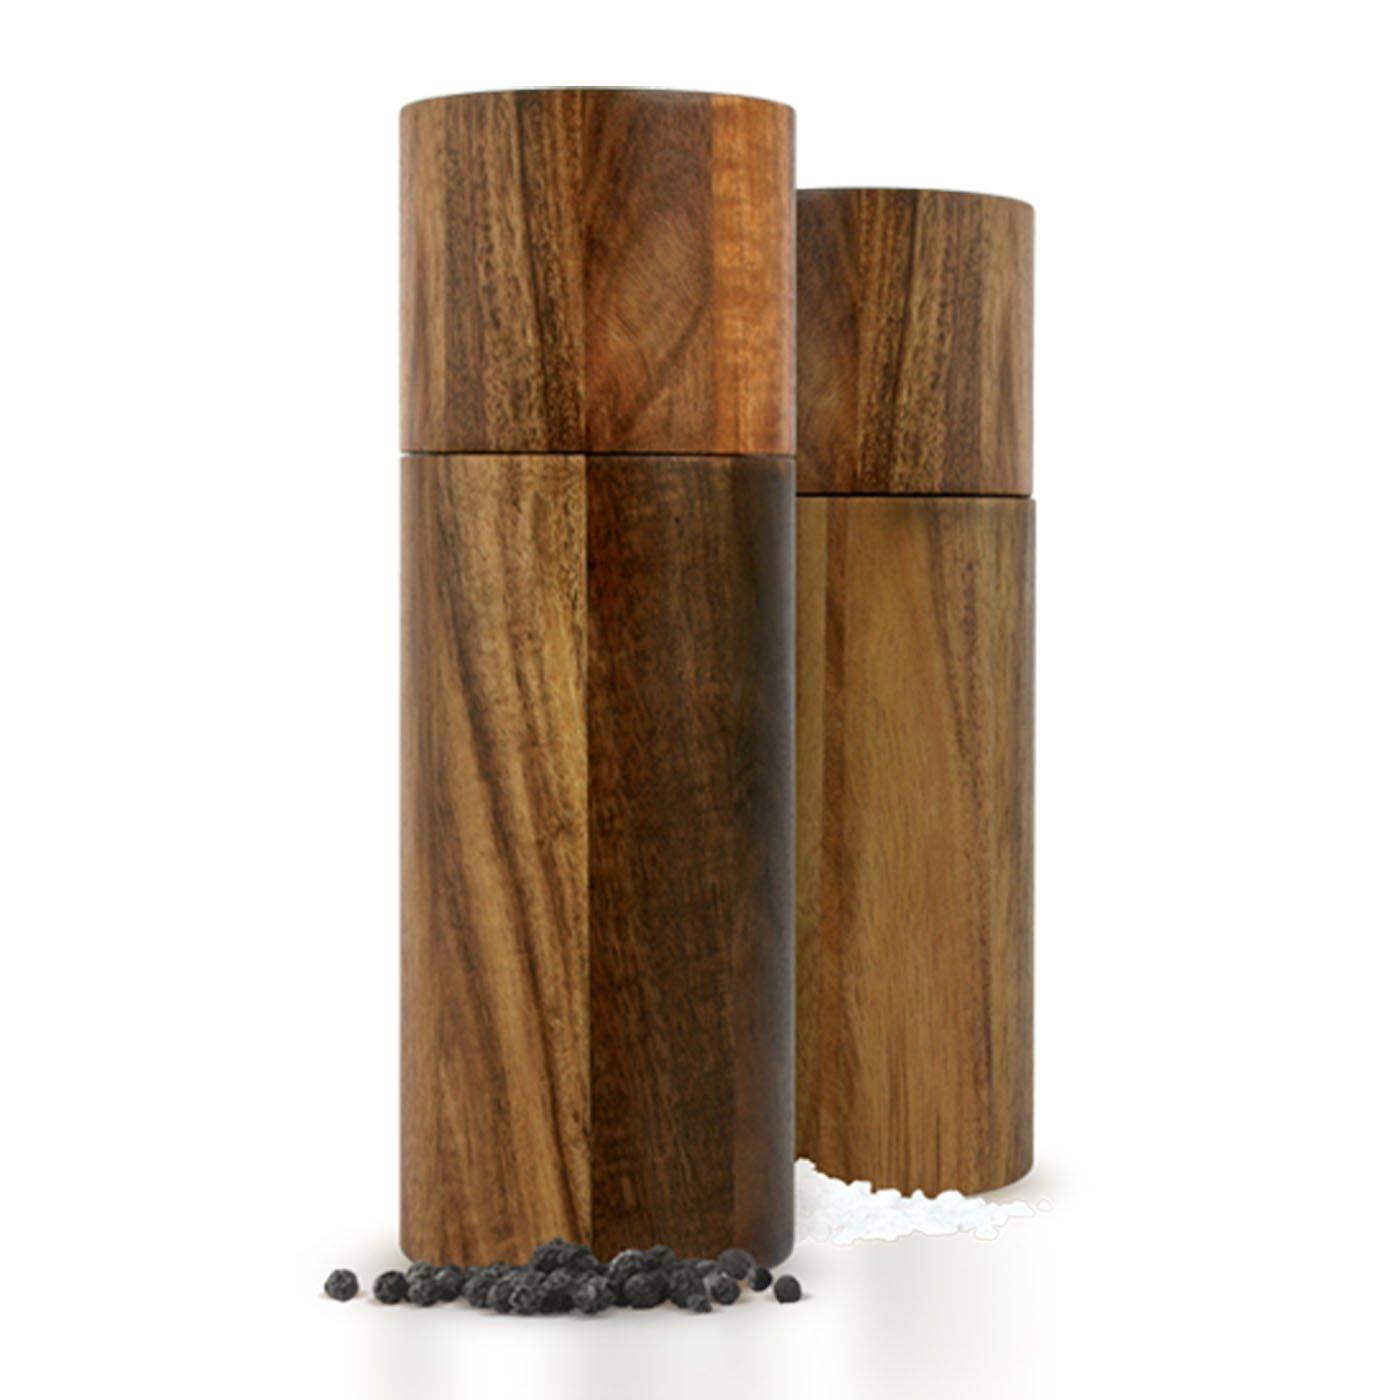 adhoc pfeffer oder salzm hle acacia gew rz kr uter. Black Bedroom Furniture Sets. Home Design Ideas